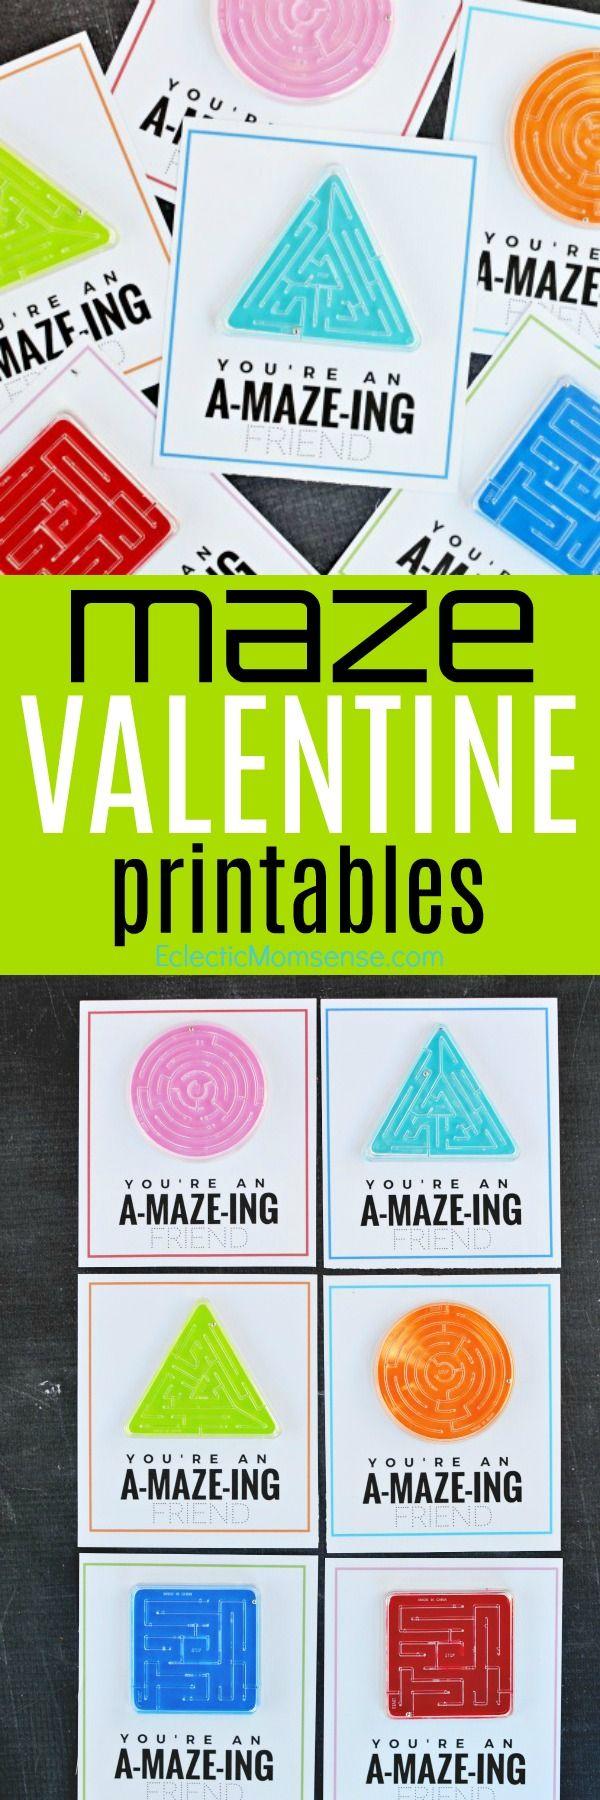 FREE Maze Valentine printables- An a-maze-ing kids Valentine card!